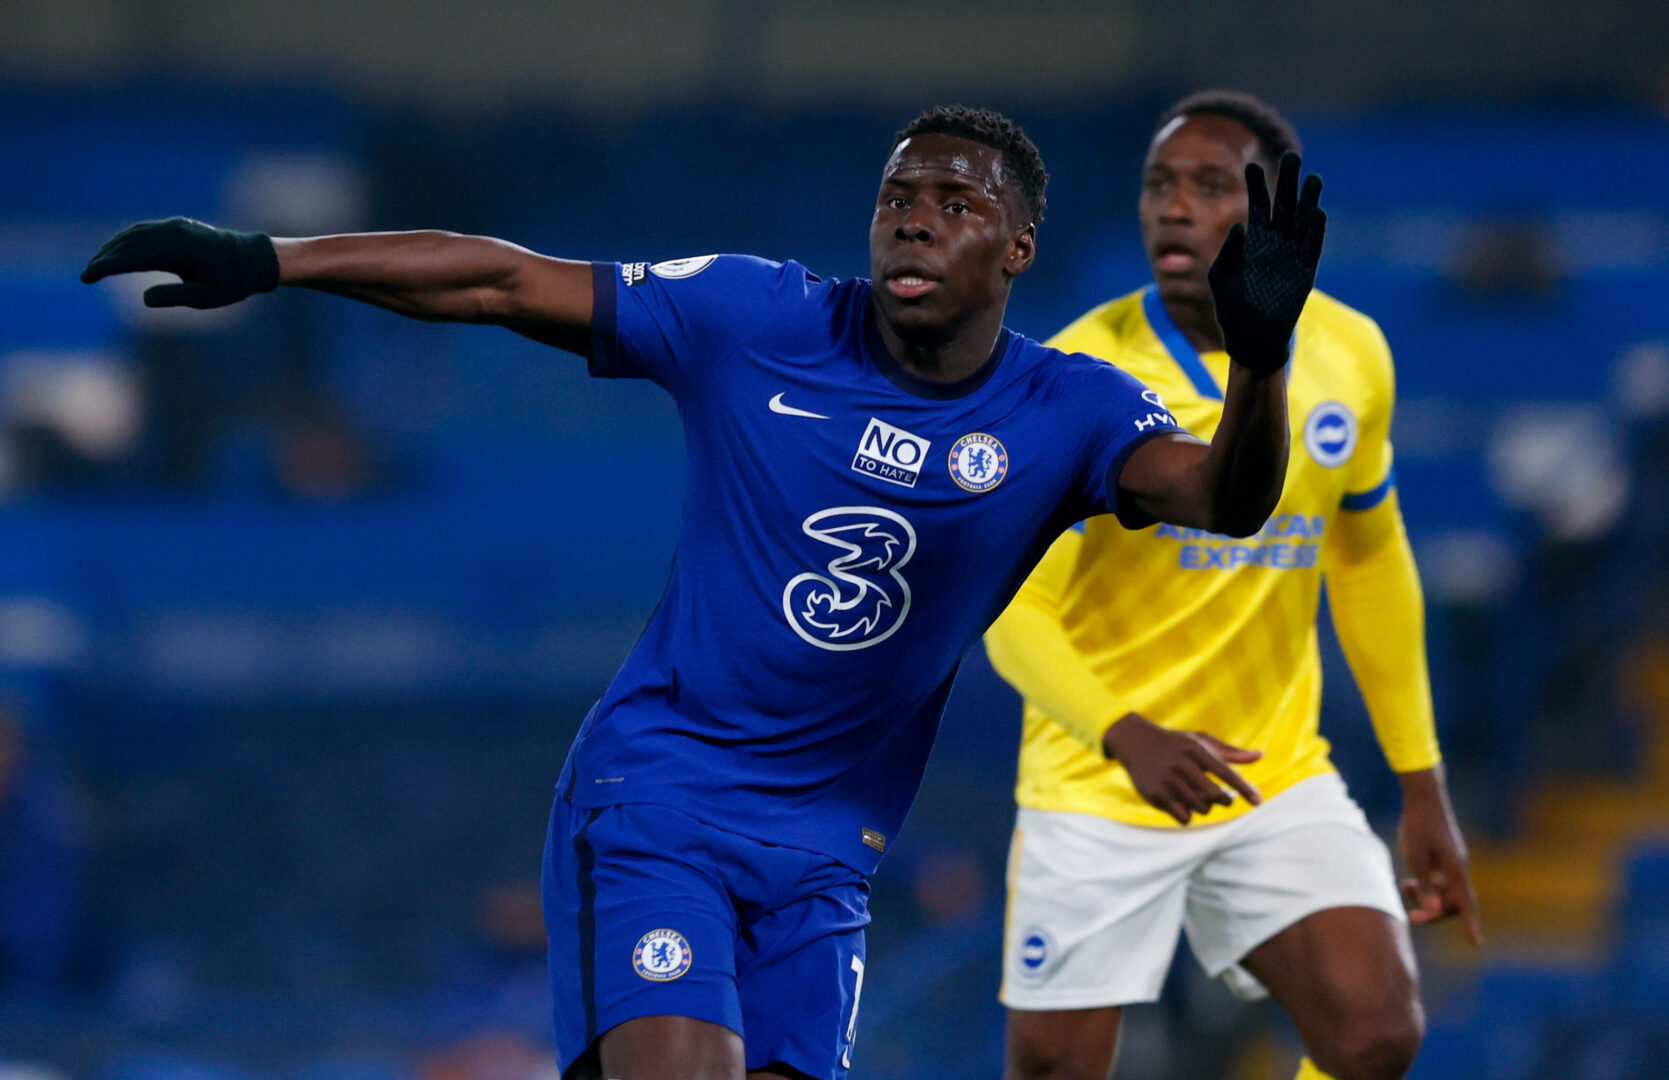 Chelseas Kurt Zouma im Spiel gegen Brighton and Hove Albion